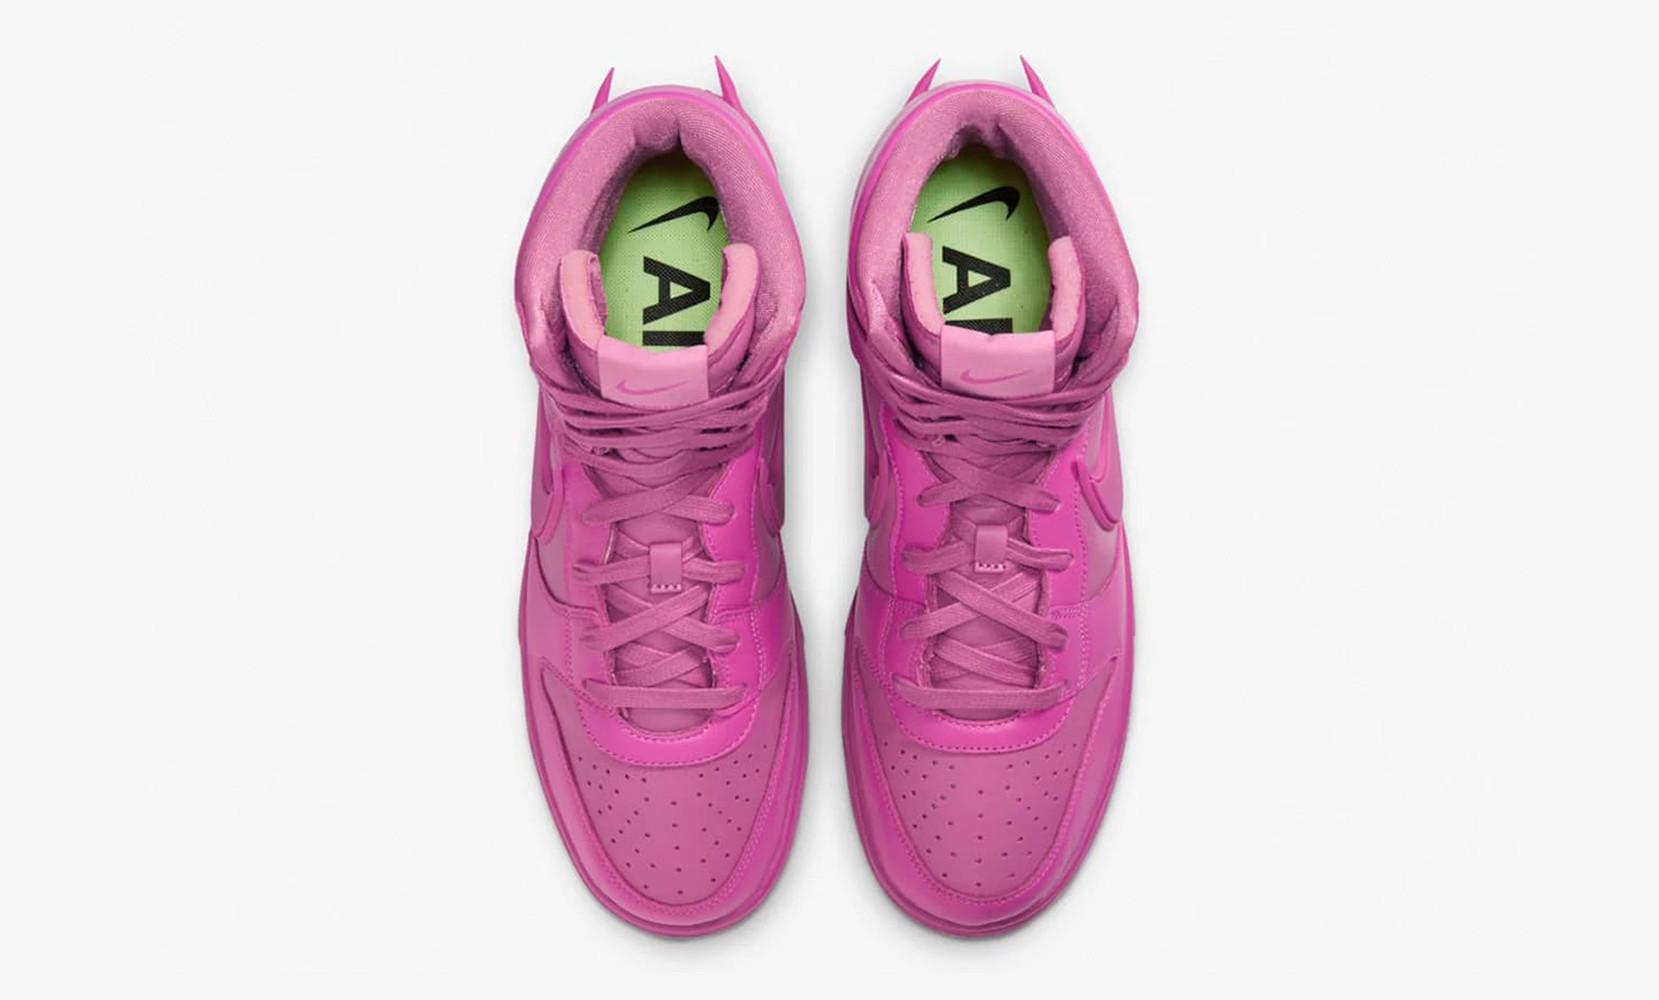 Ambush x Nike Dunk High Lethal Pink